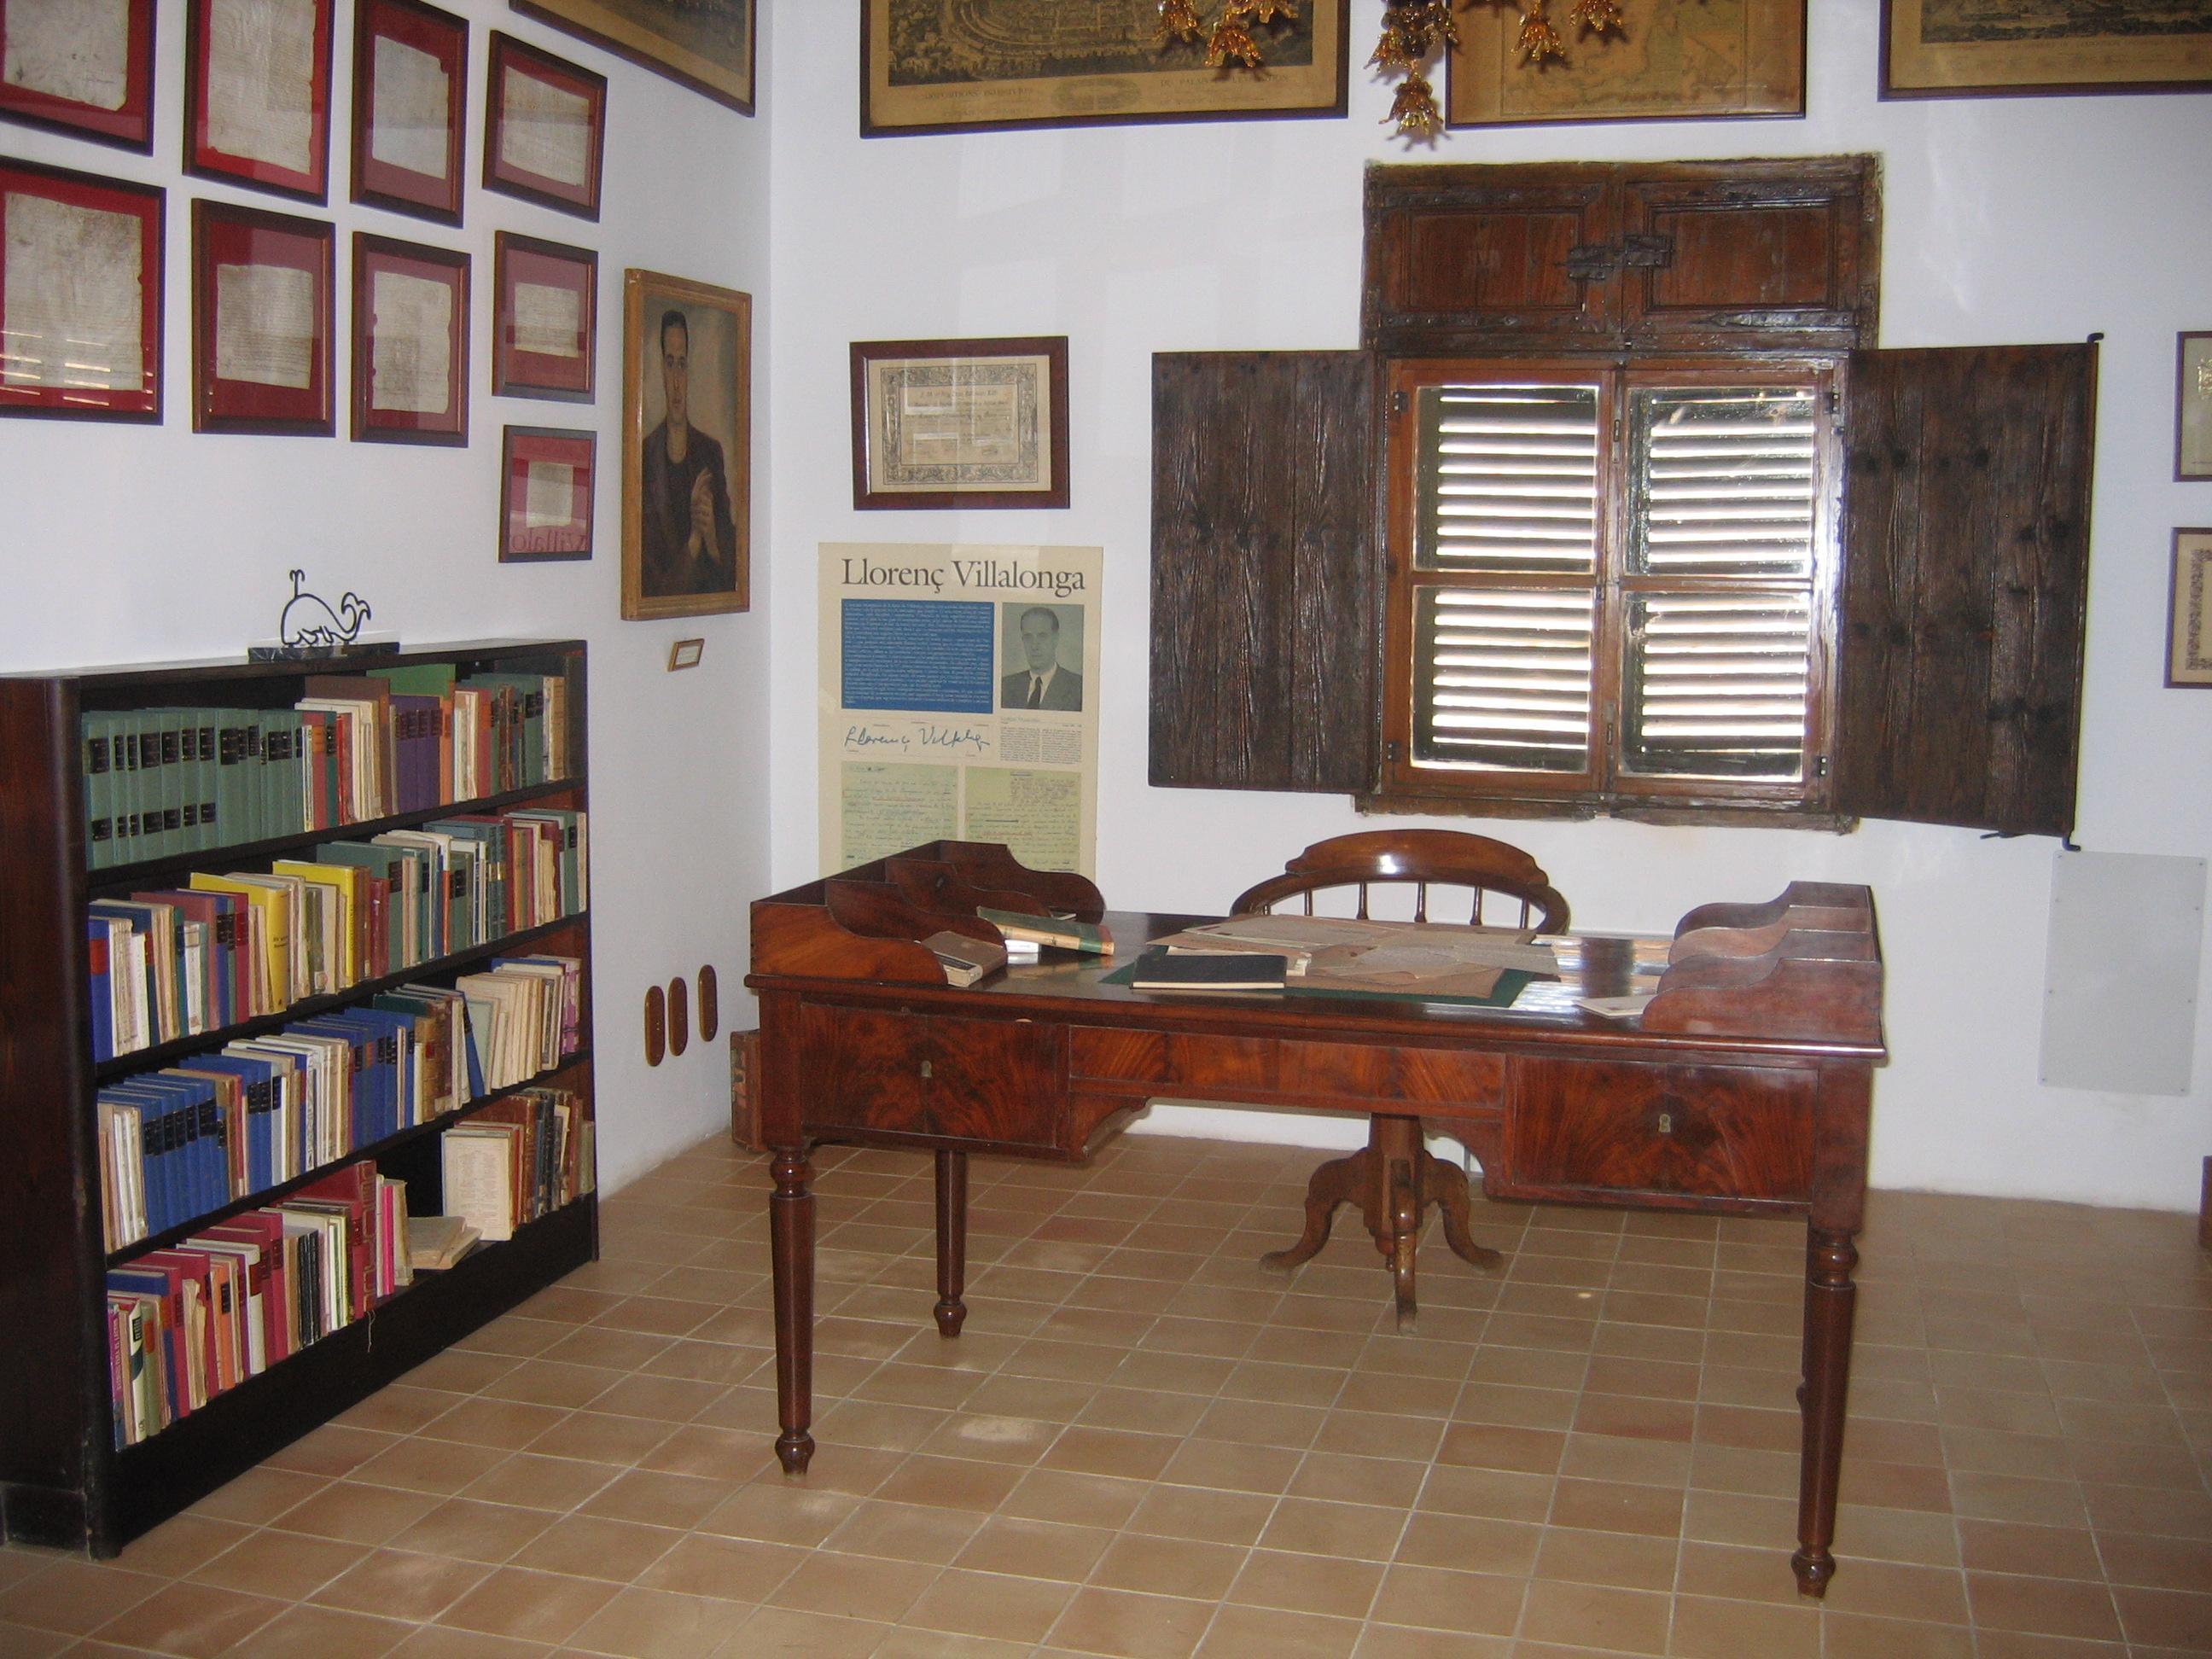 Casa Llorenc Villalonga (Museu Literari). Illes Balears